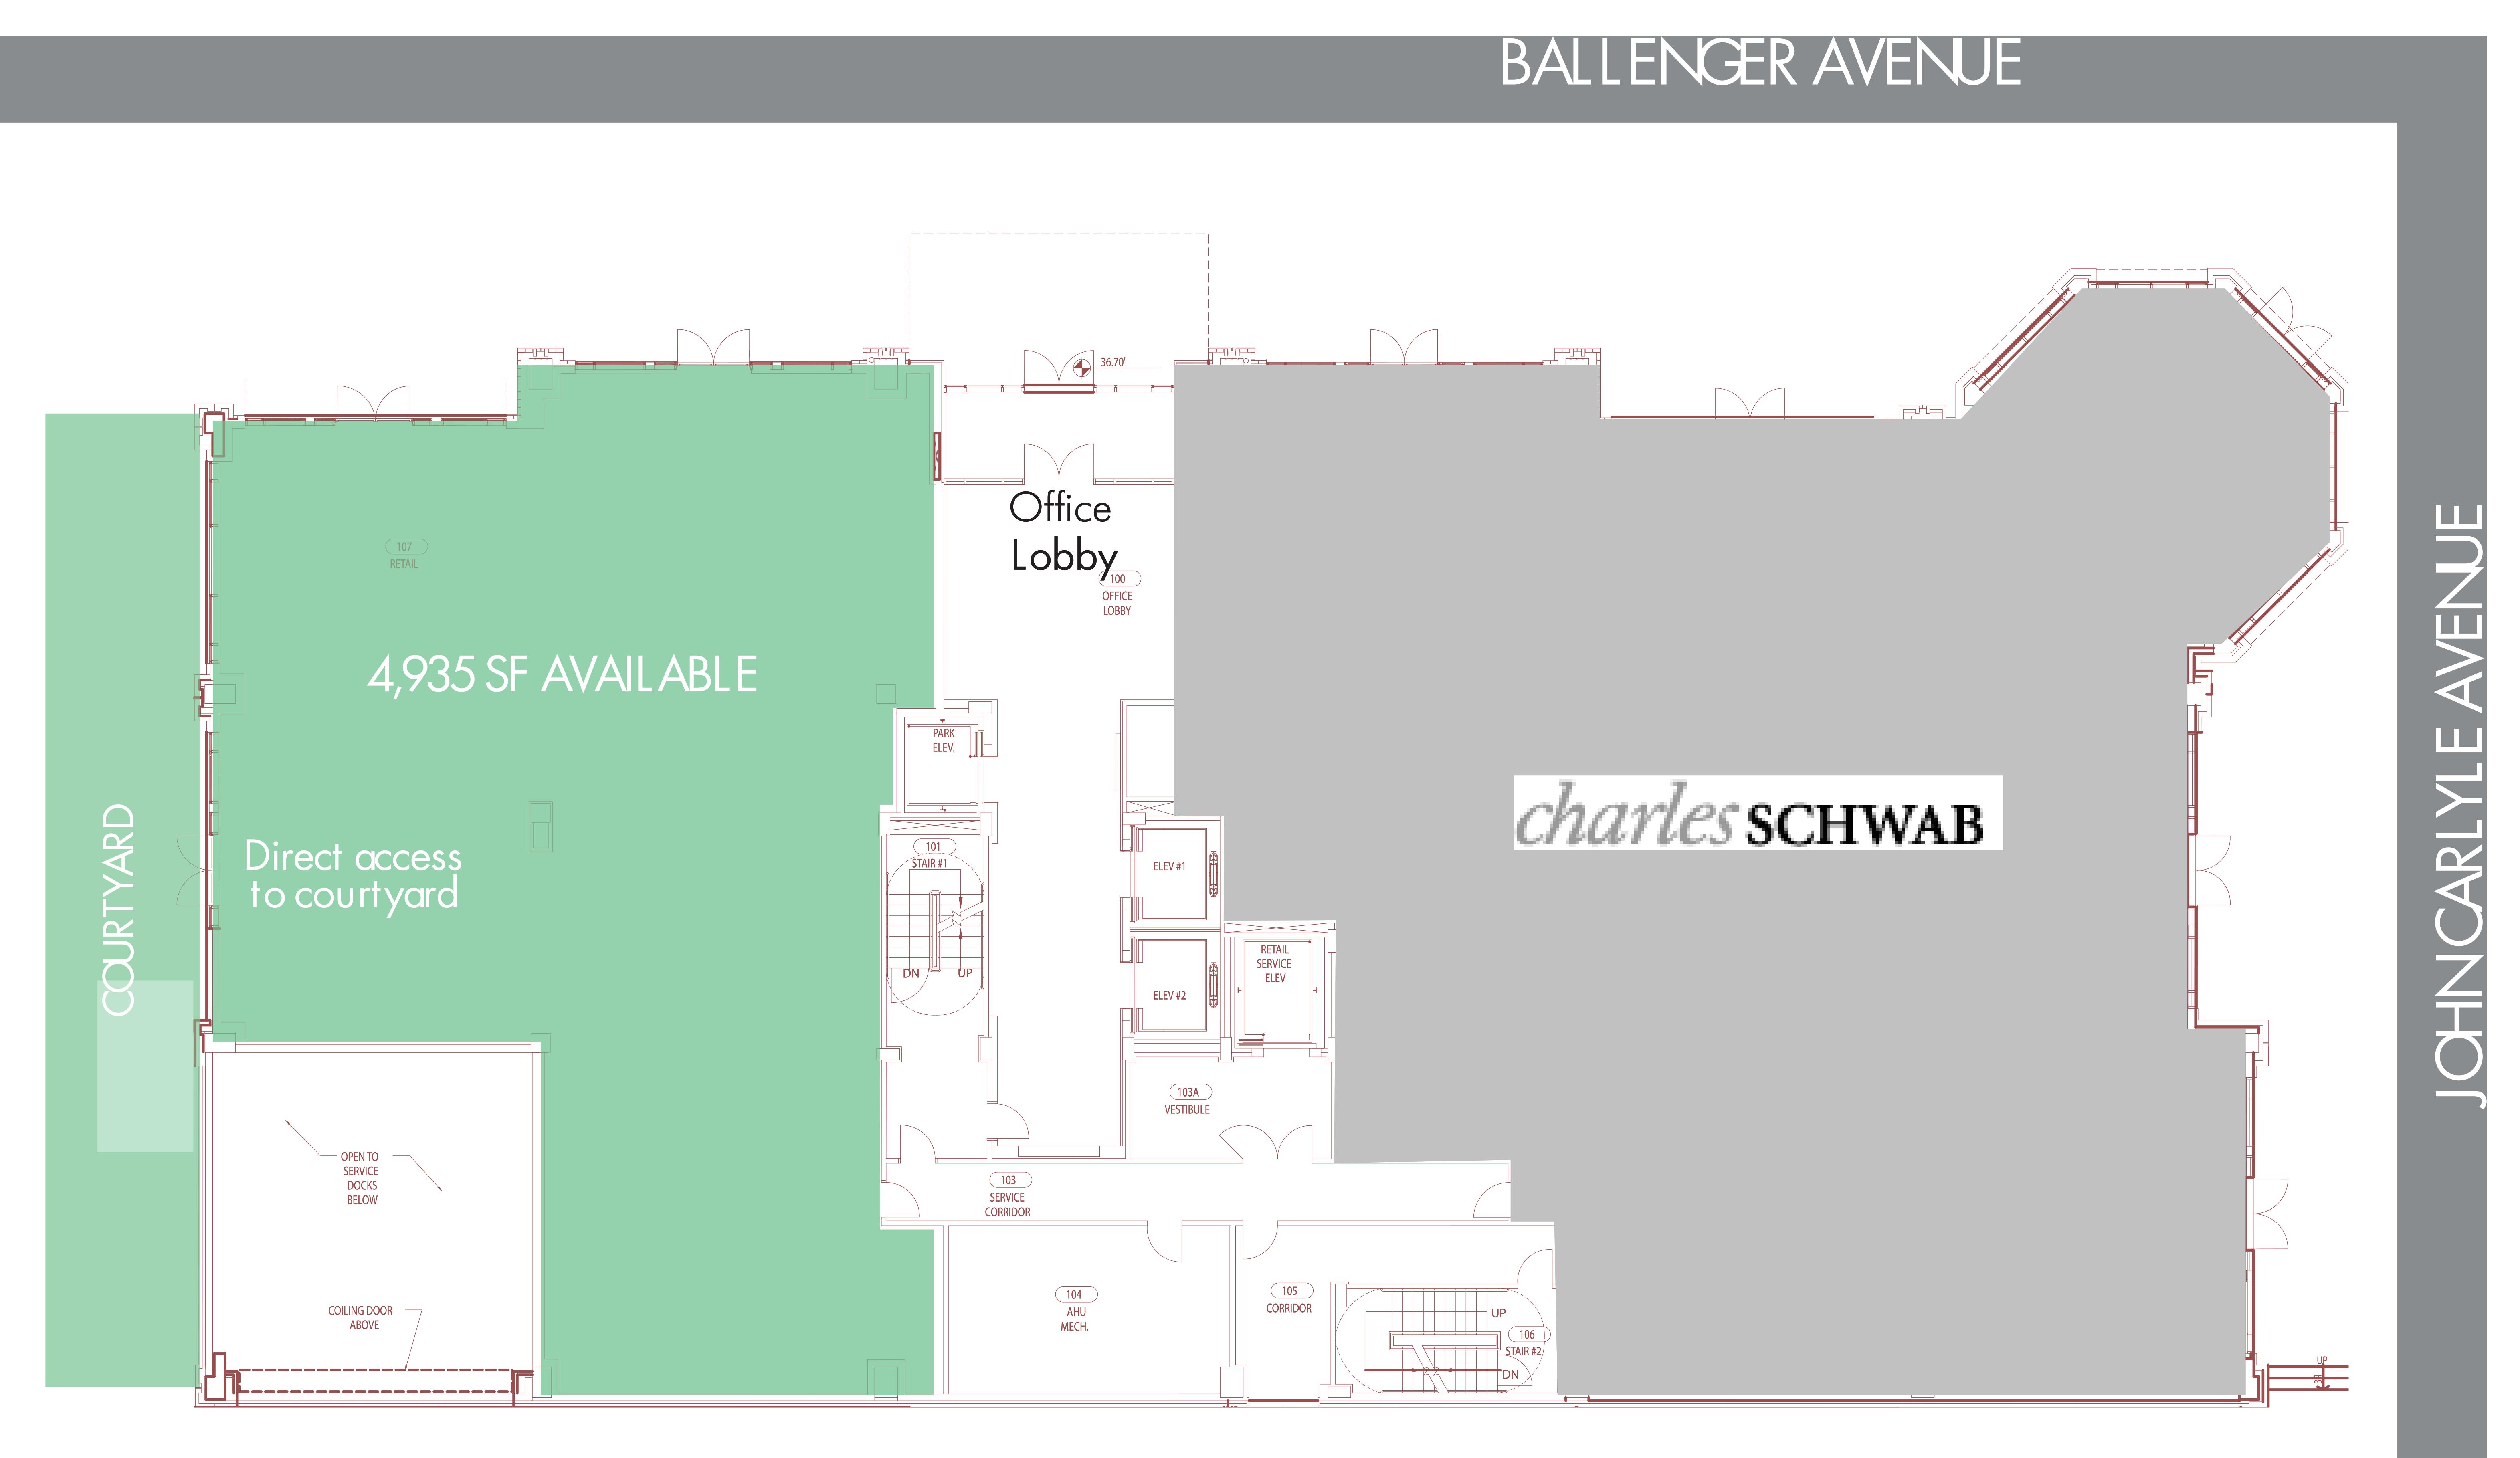 1920 Ballenger Avenue: site plan